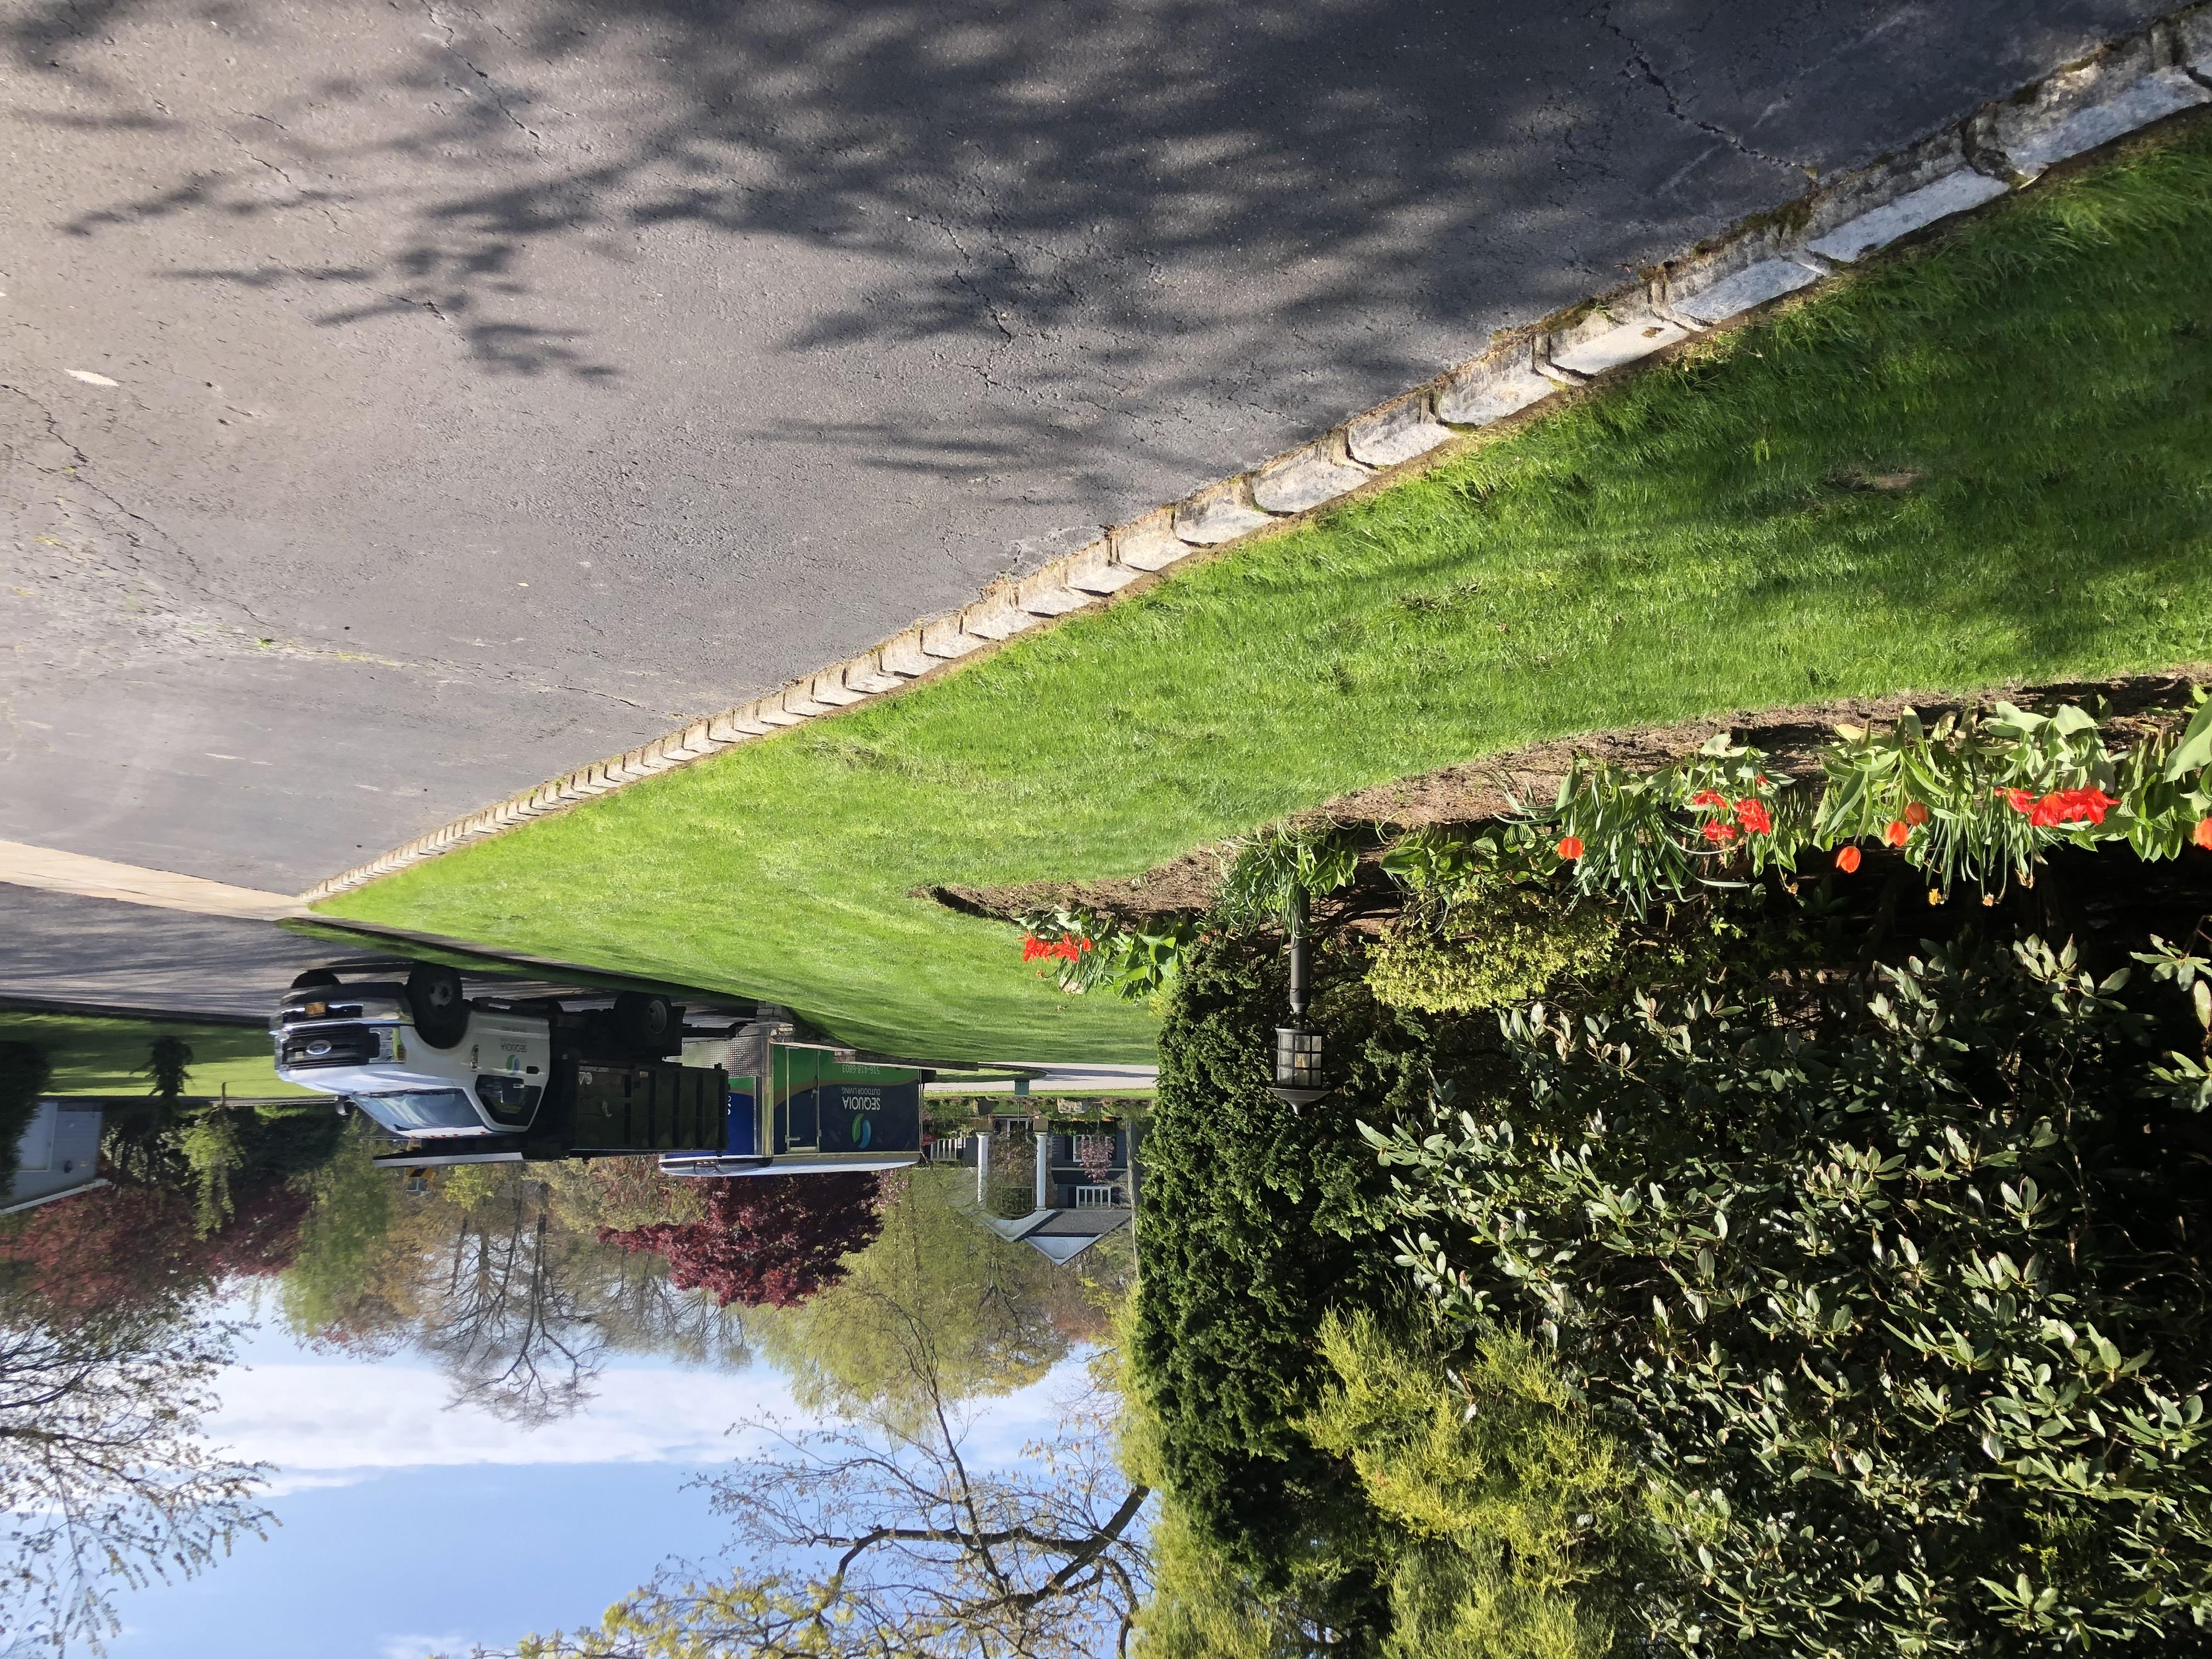 Landscape Management | Sequoia Outdoor Living on Sequoia Outdoor Living id=15299